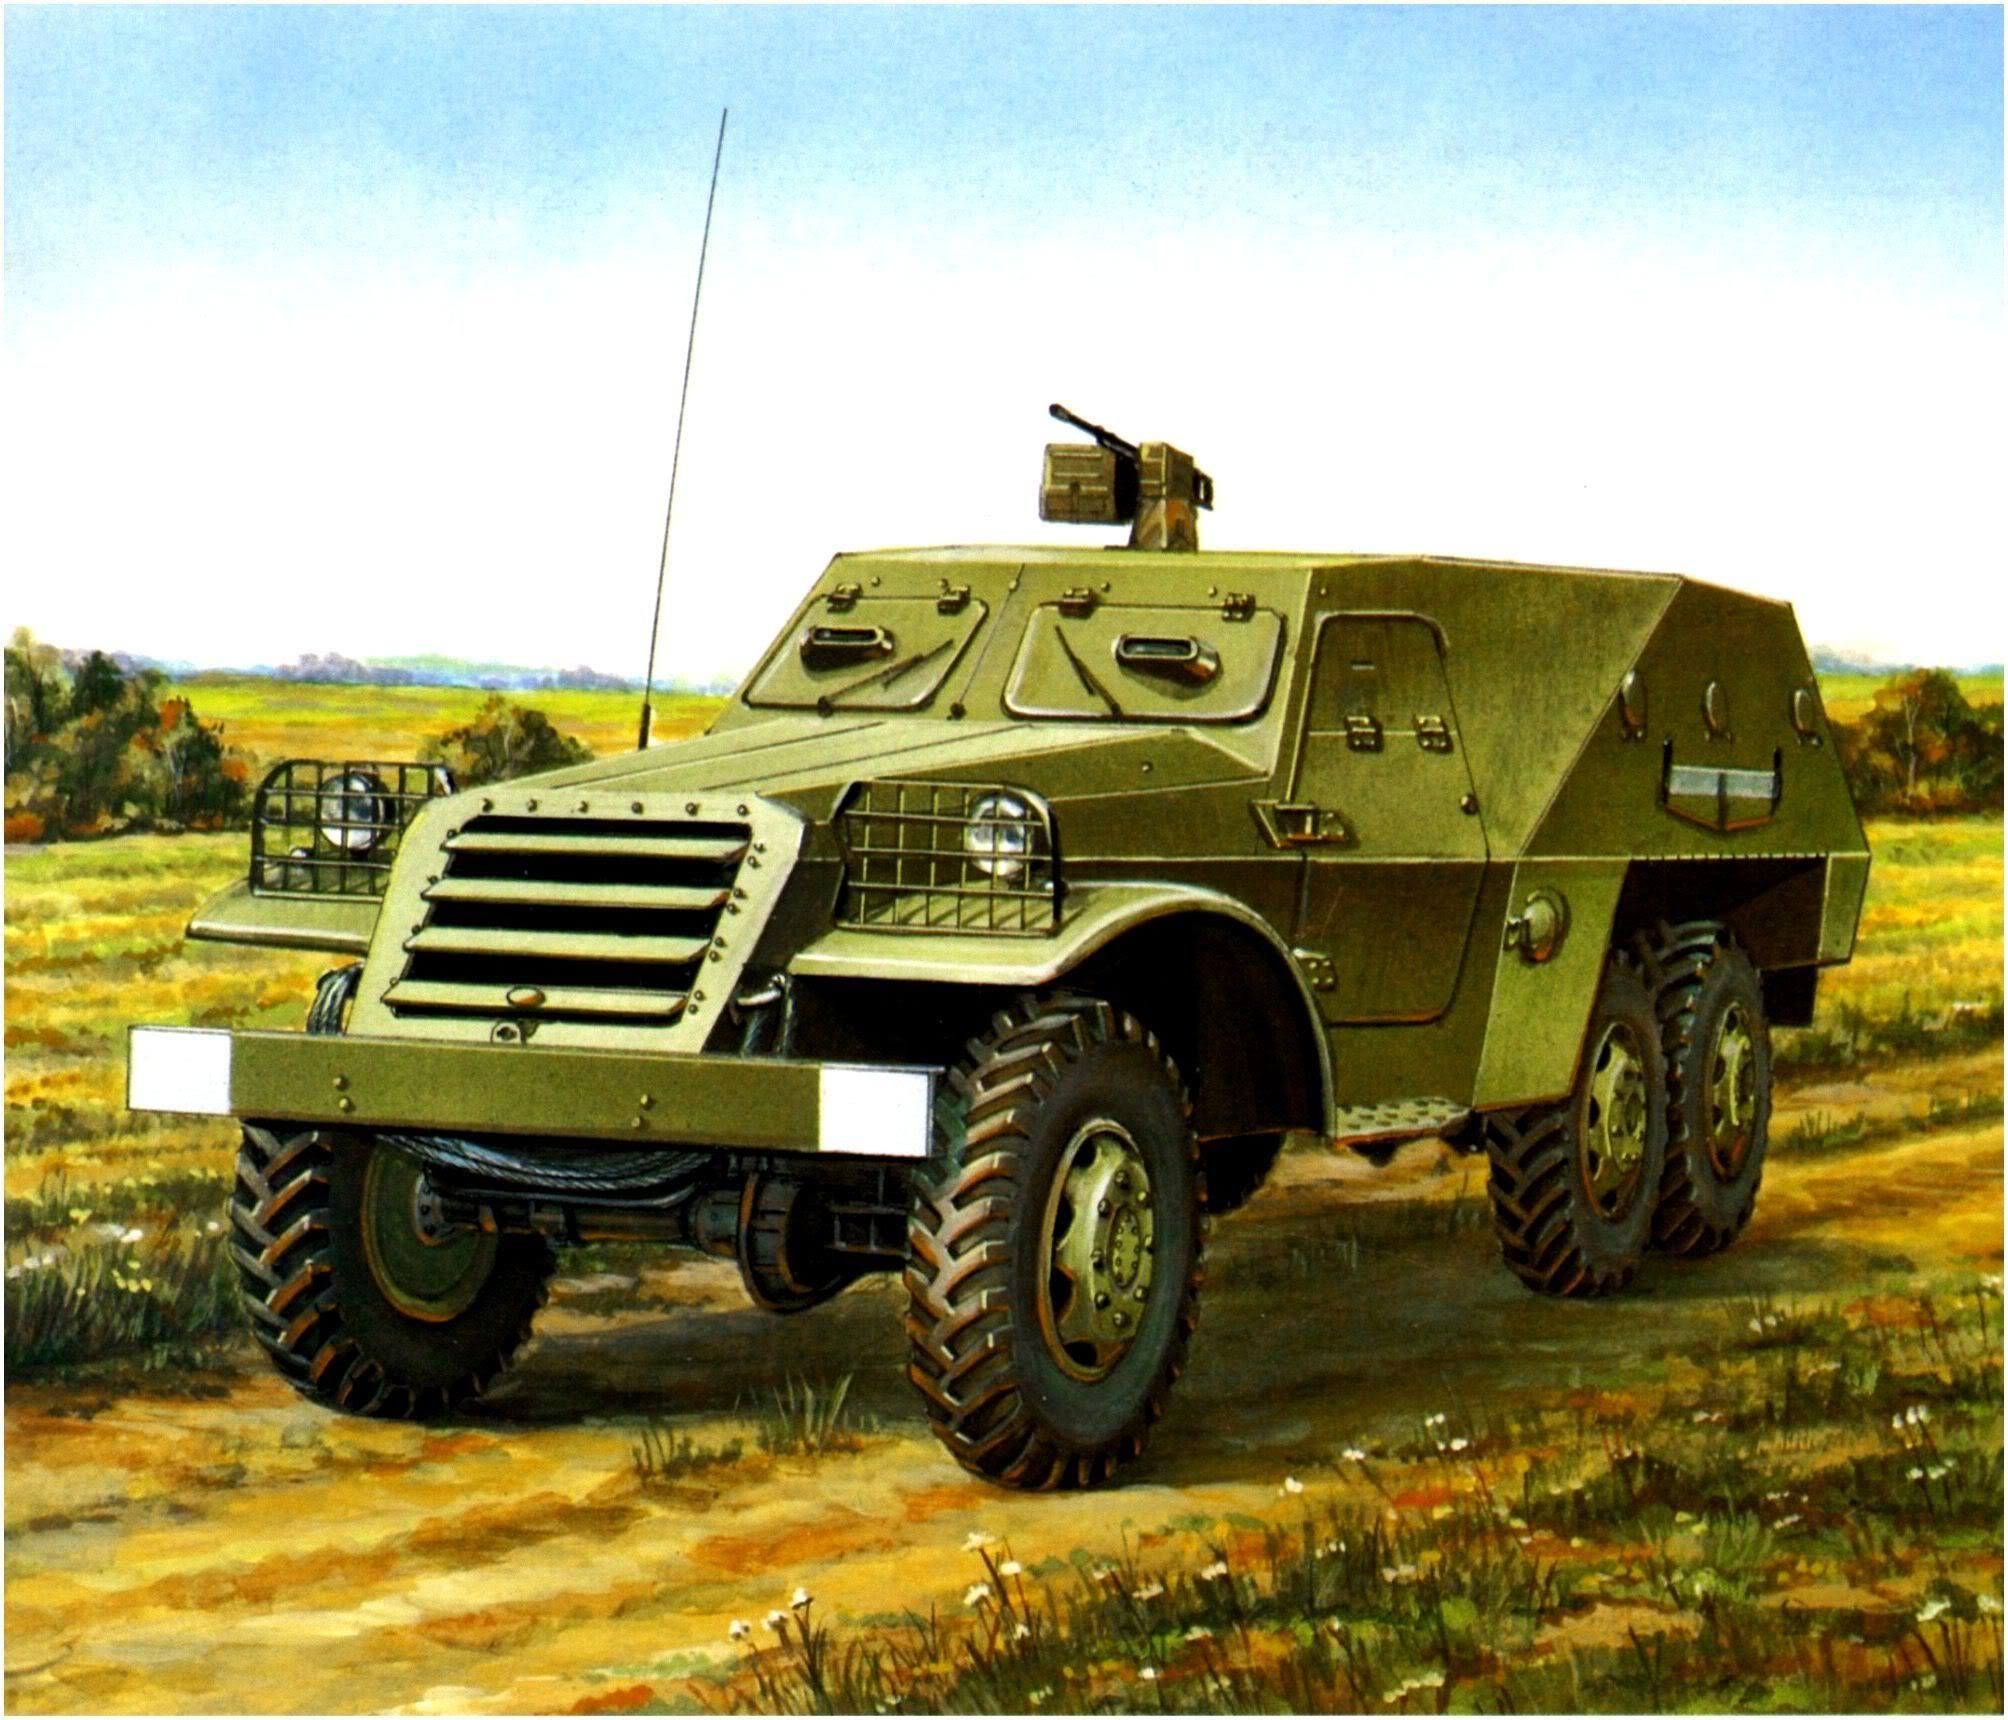 Imagen Vehiculos Militares Militar Vehiculos